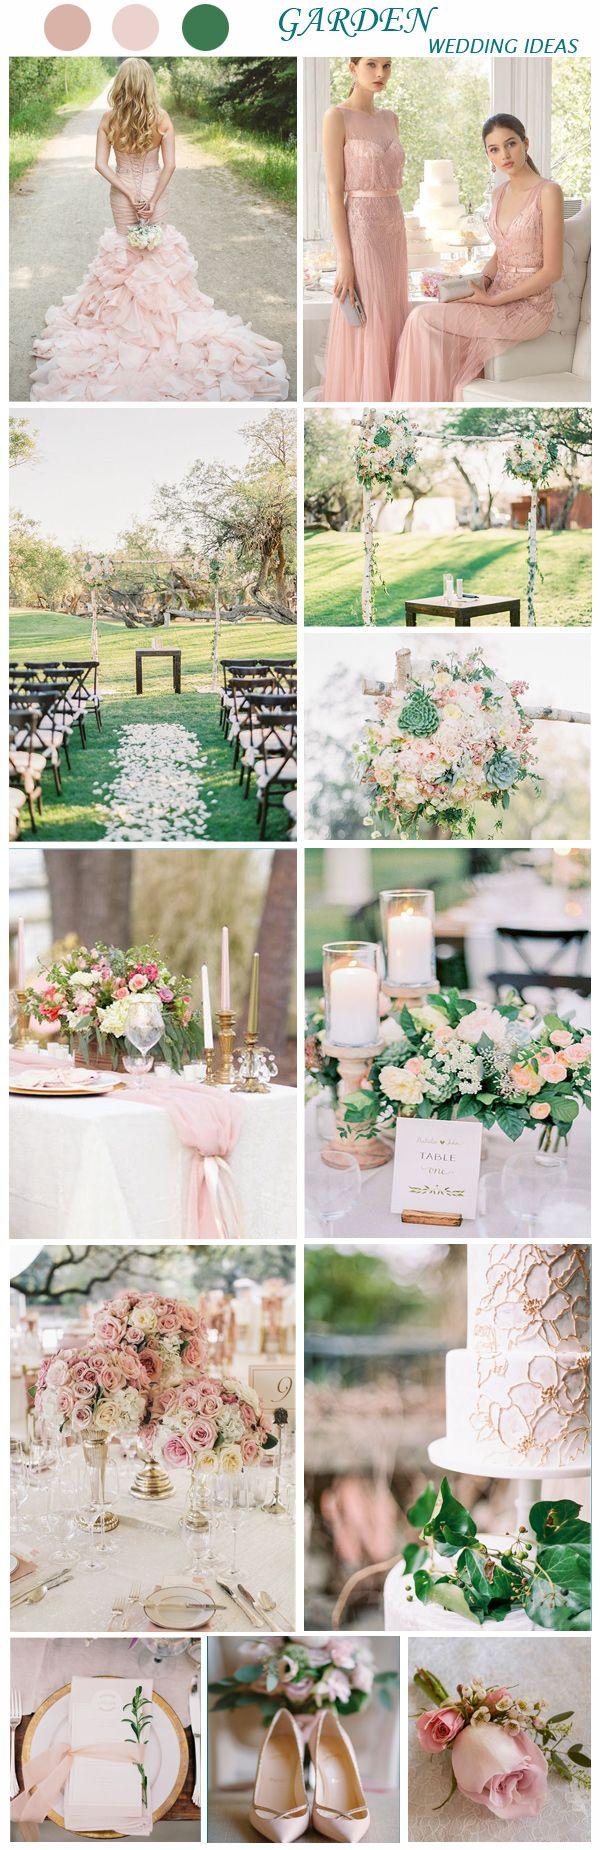 how to decorate the garden wedding of year 2017 | garden wedding